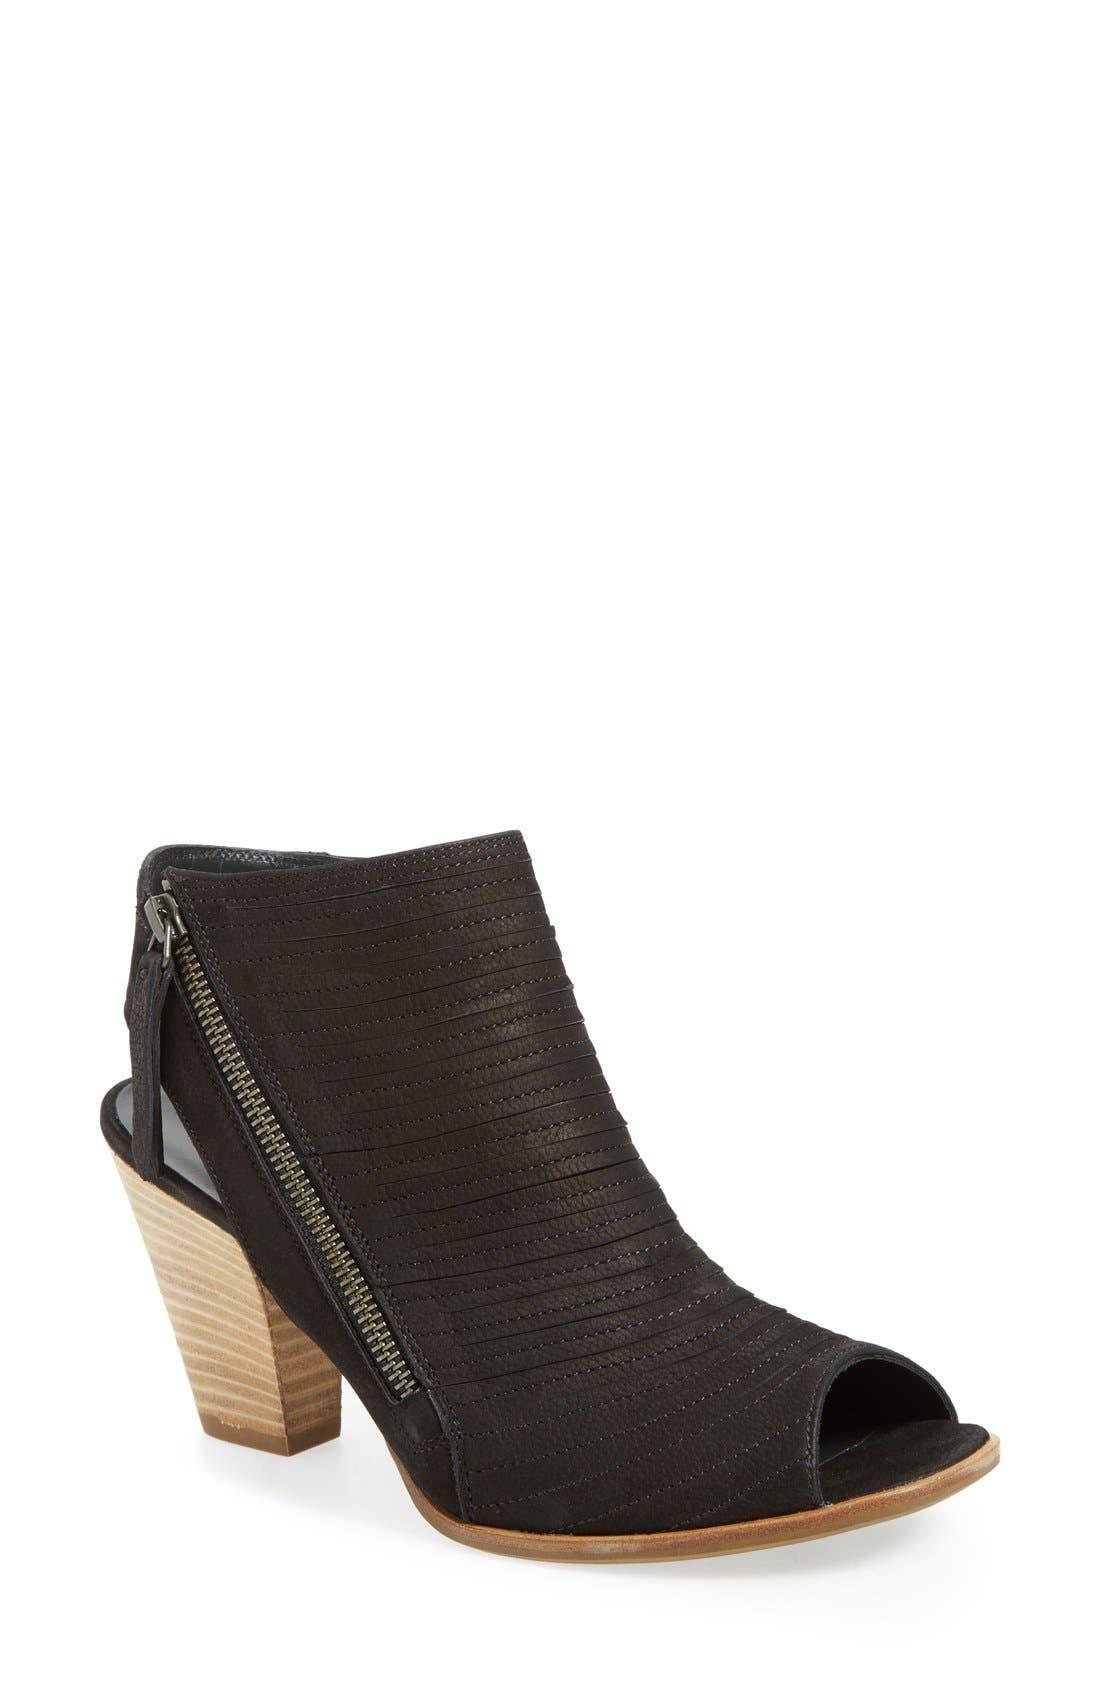 'Cayanne' Leather Peep Toe Sandal,                             Main thumbnail 6, color,